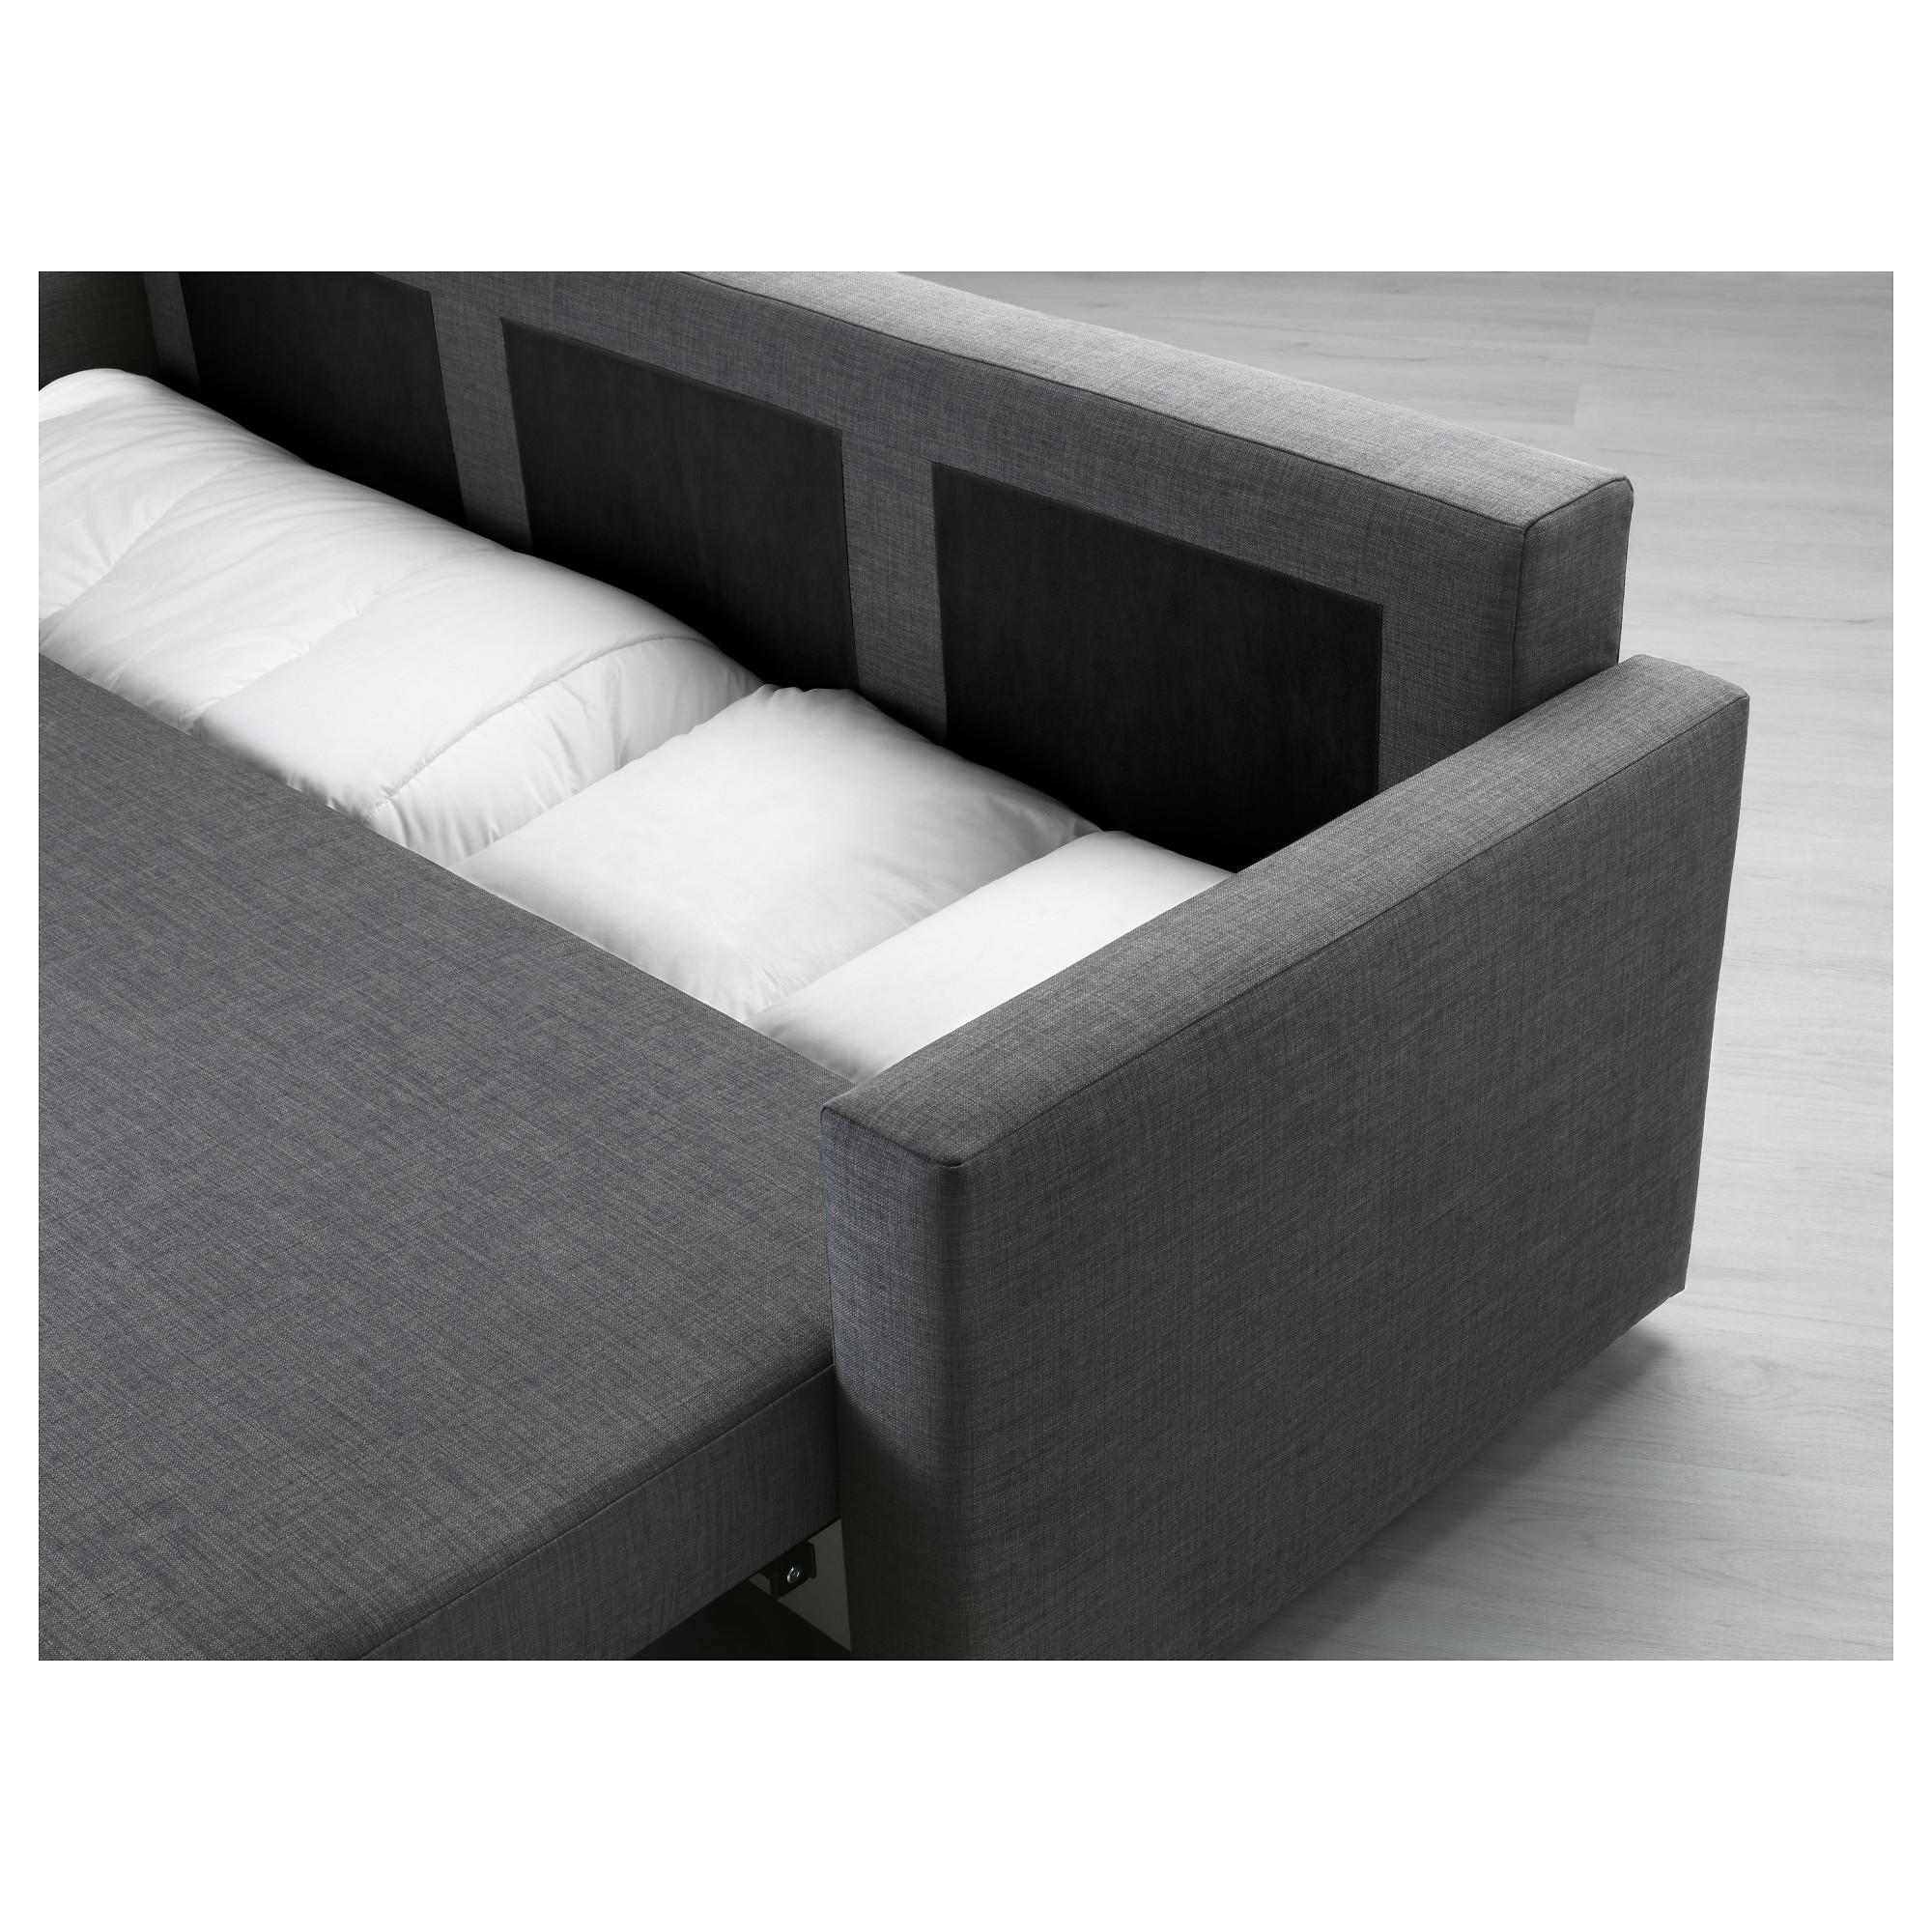 Remarkable Friheten Three Seat Sofa Bed Skiftebo Dark Grey Ikea Ibusinesslaw Wood Chair Design Ideas Ibusinesslaworg